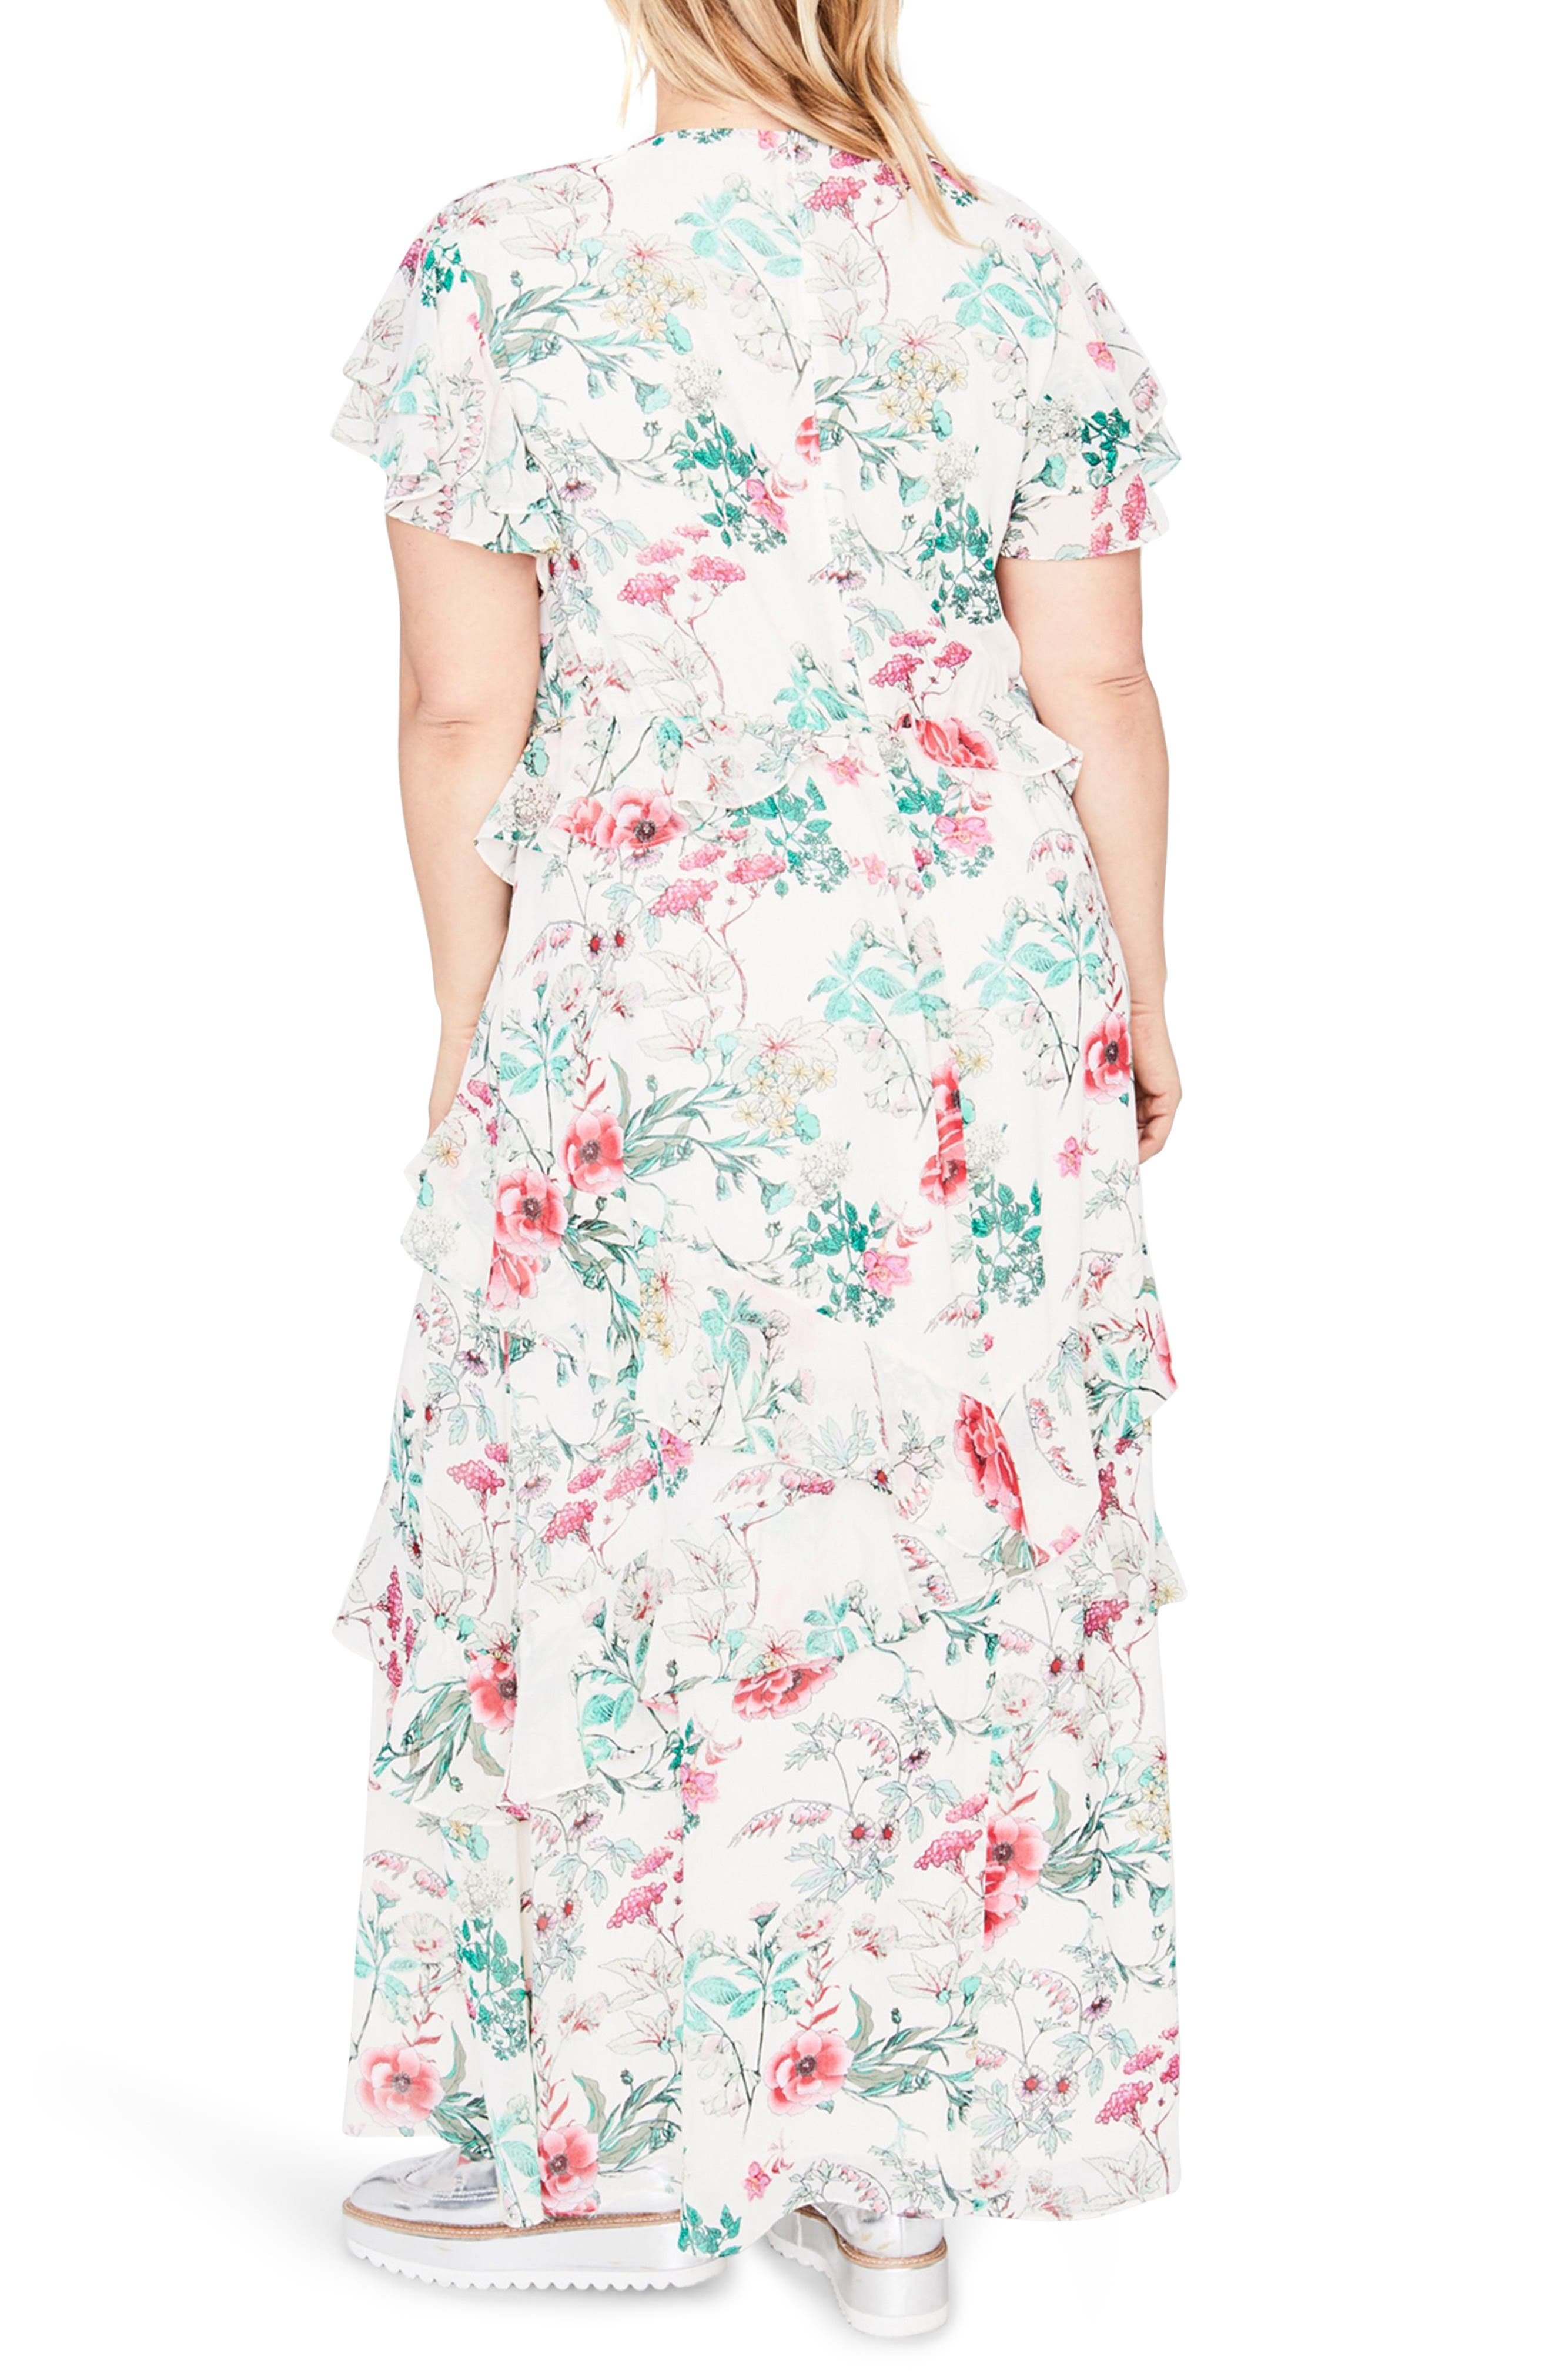 Ruffle Floral Maxi Dress,                             Alternate thumbnail 2, color,                             Almond Milk Combo